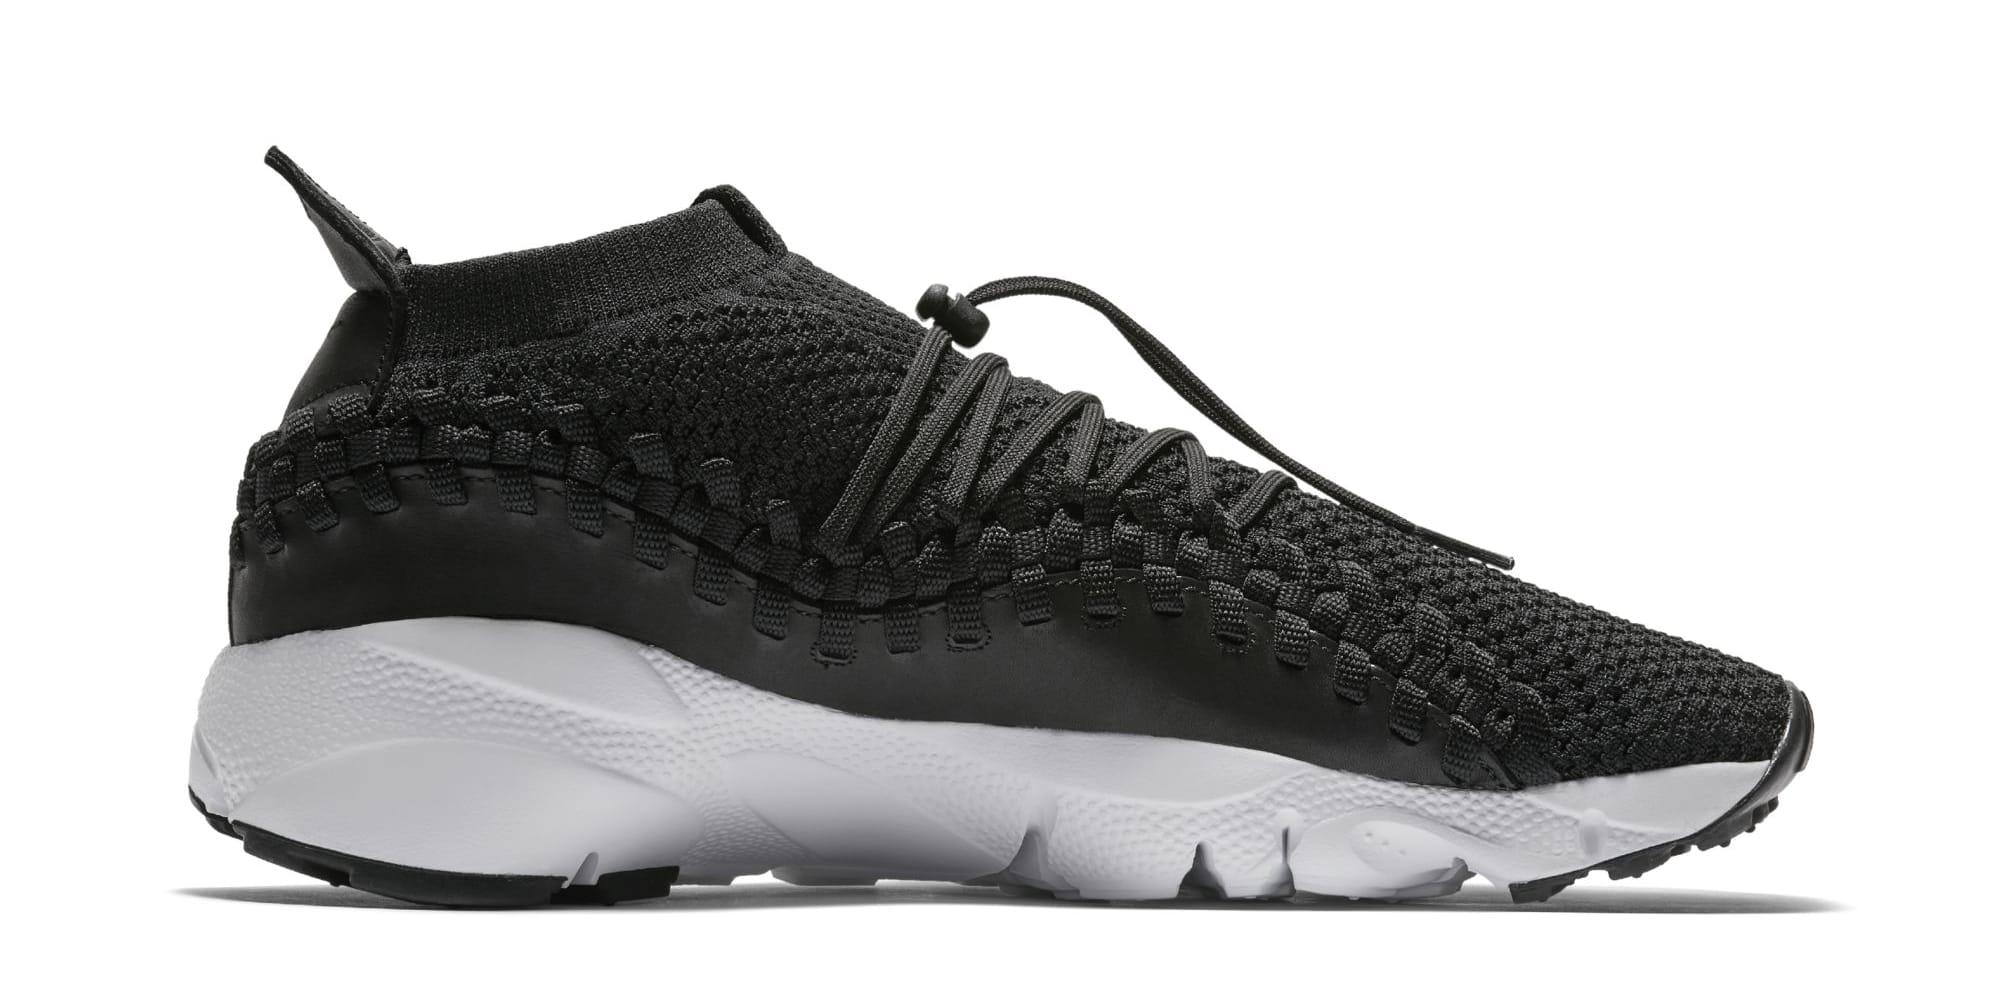 Nike Footscape Woven Chukka Flyknit 'Black' AO5417-001 (Medial)